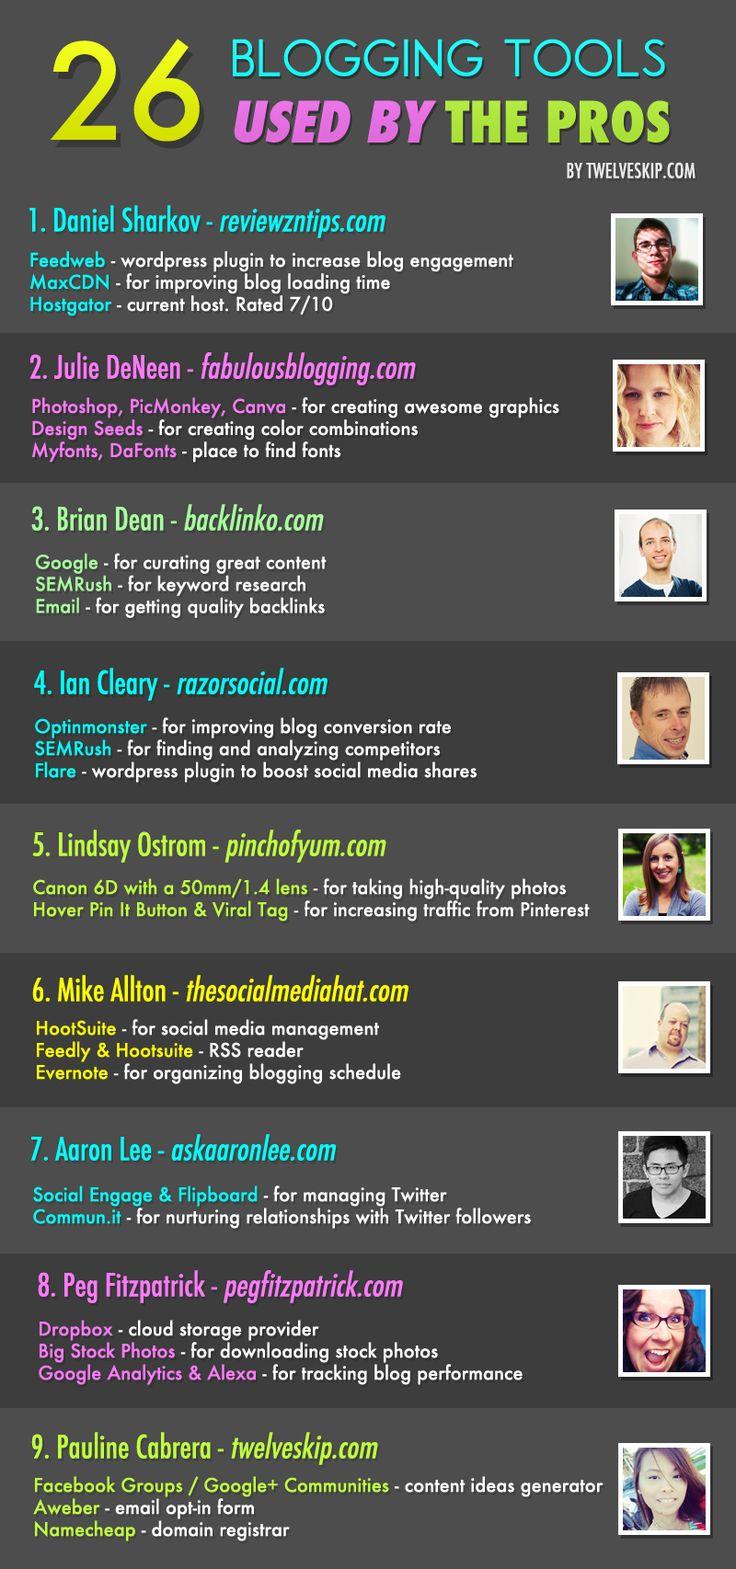 26 Blogging Tools Used By The Pros #Blog #BlogTips #Blogging #BloggingTips